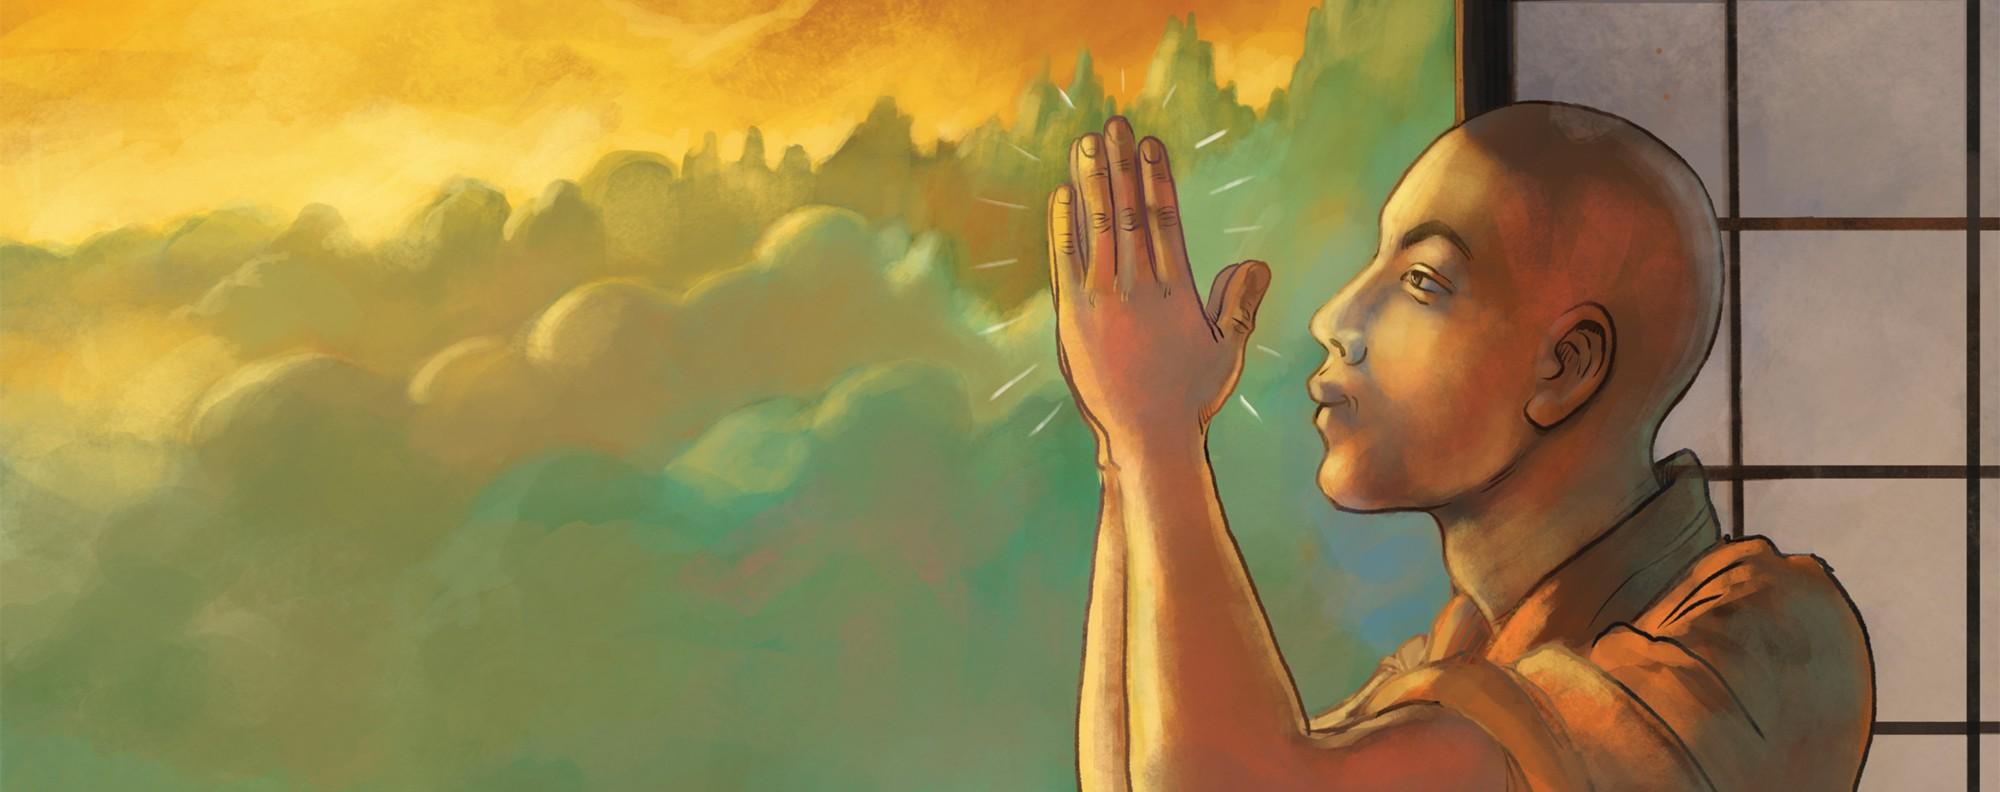 Finding quiet at a Vipassana retreat. Illustration: Adolfo Arranz